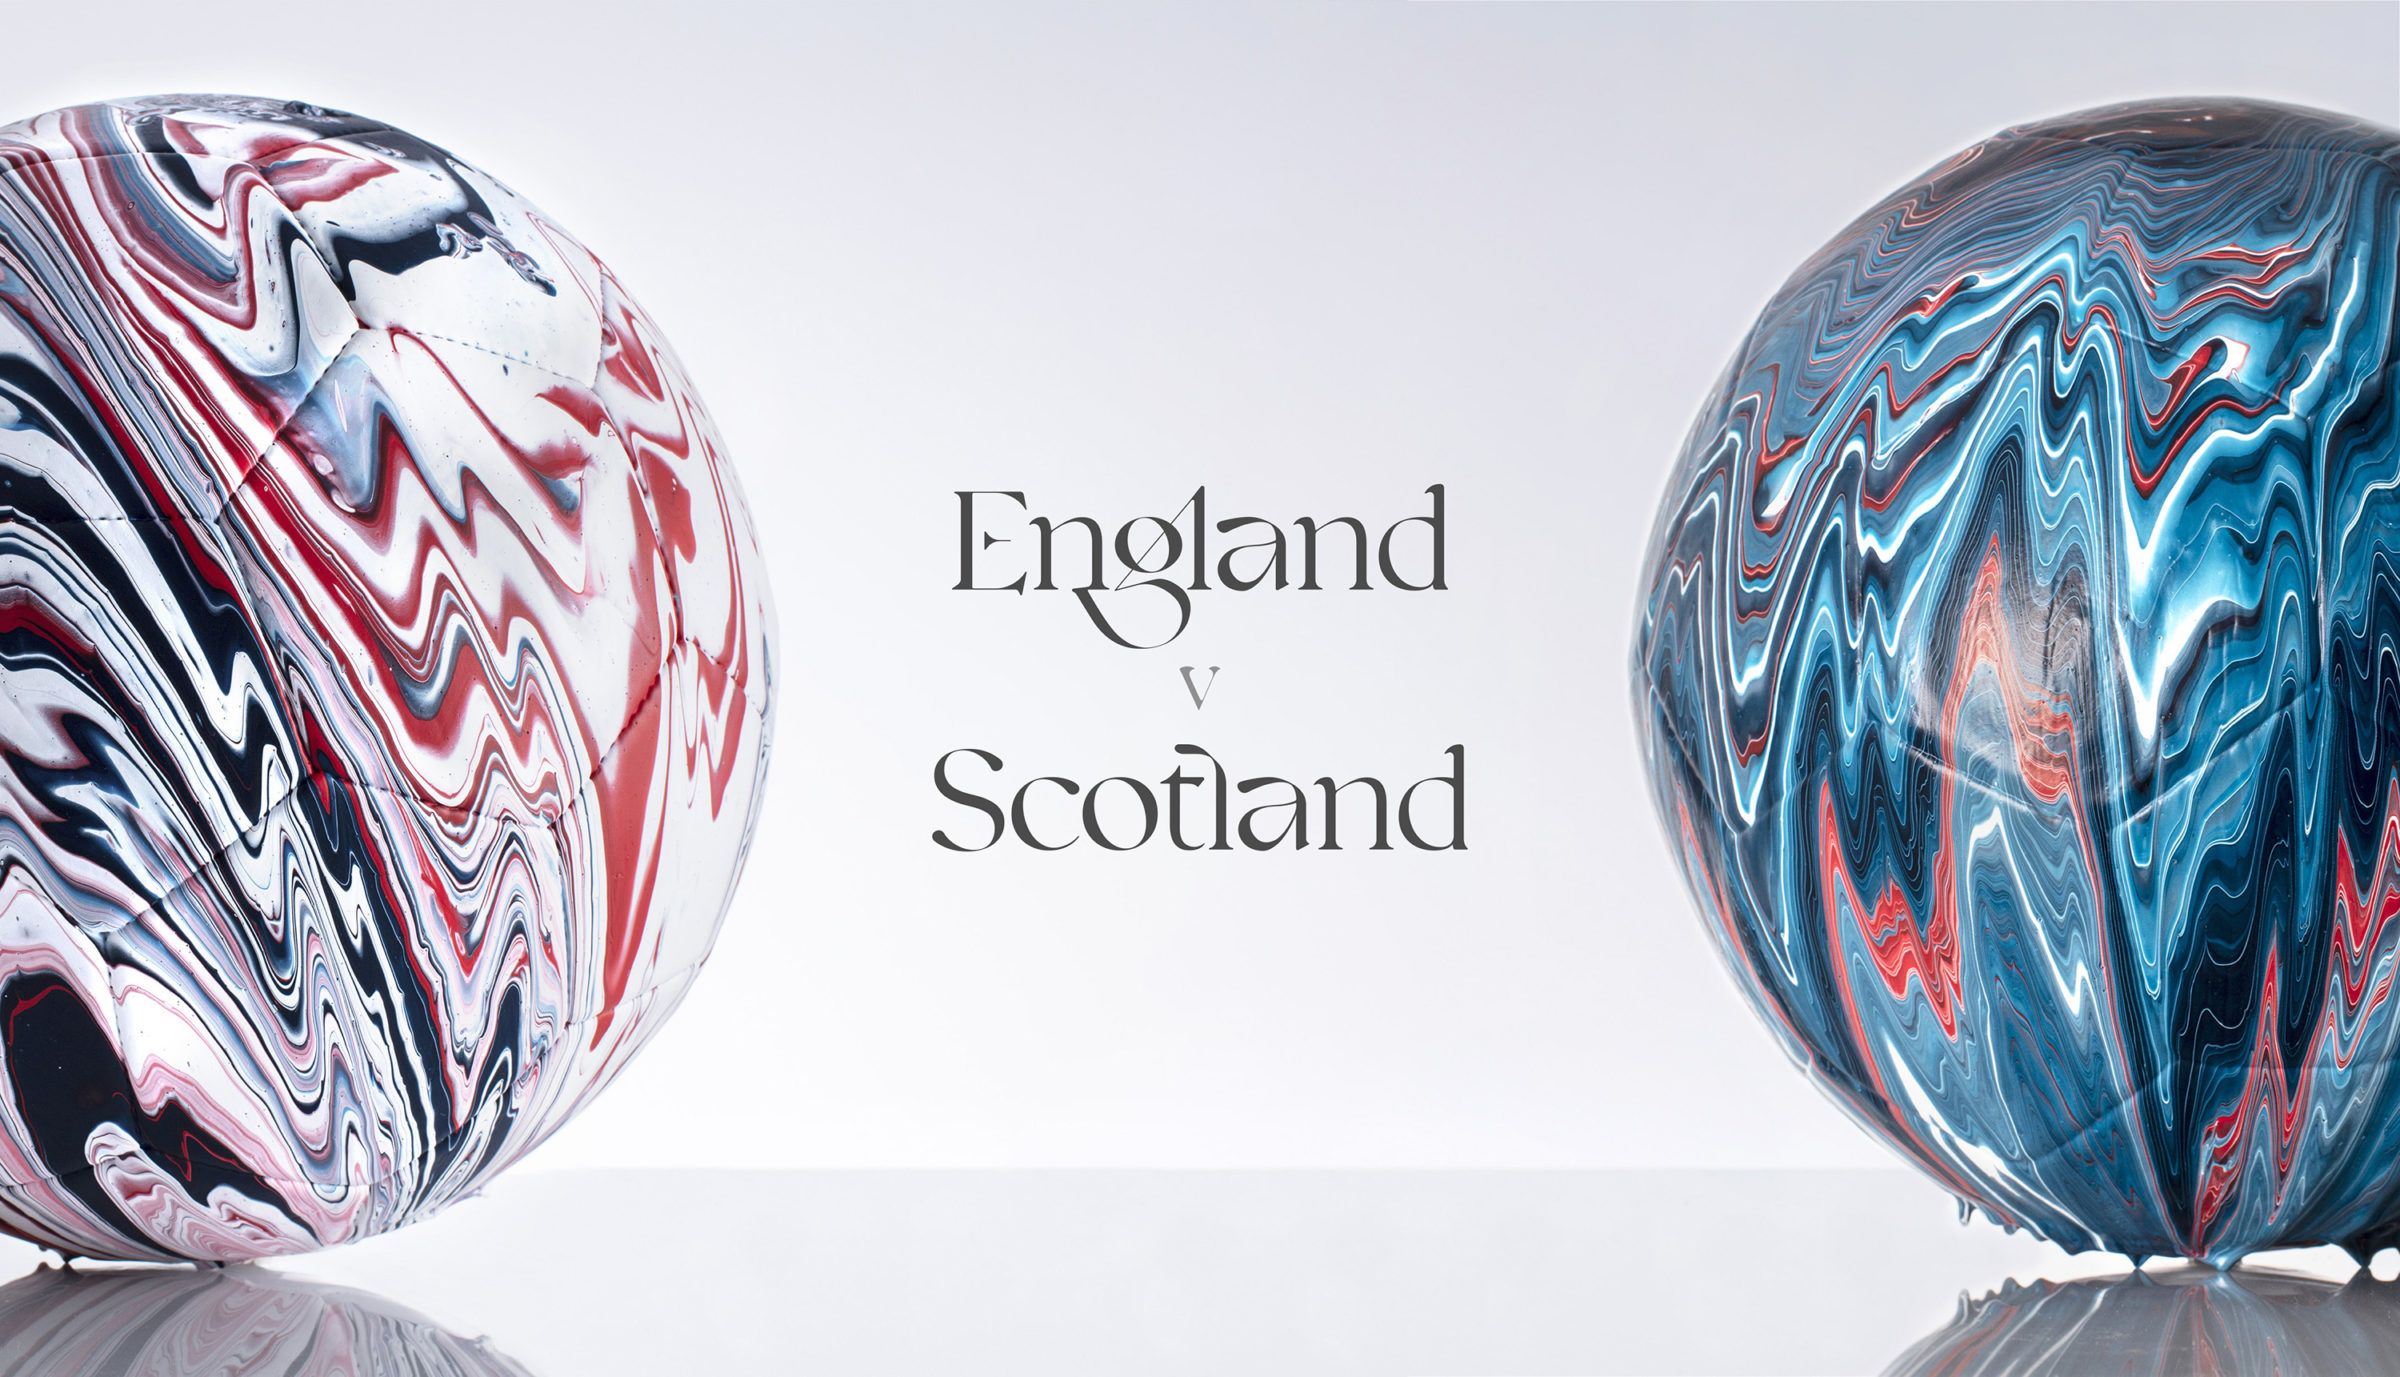 Craig Black x The Fusion Series Footballs Acrylic Fusion Football Art Installation 15 England v Scotland